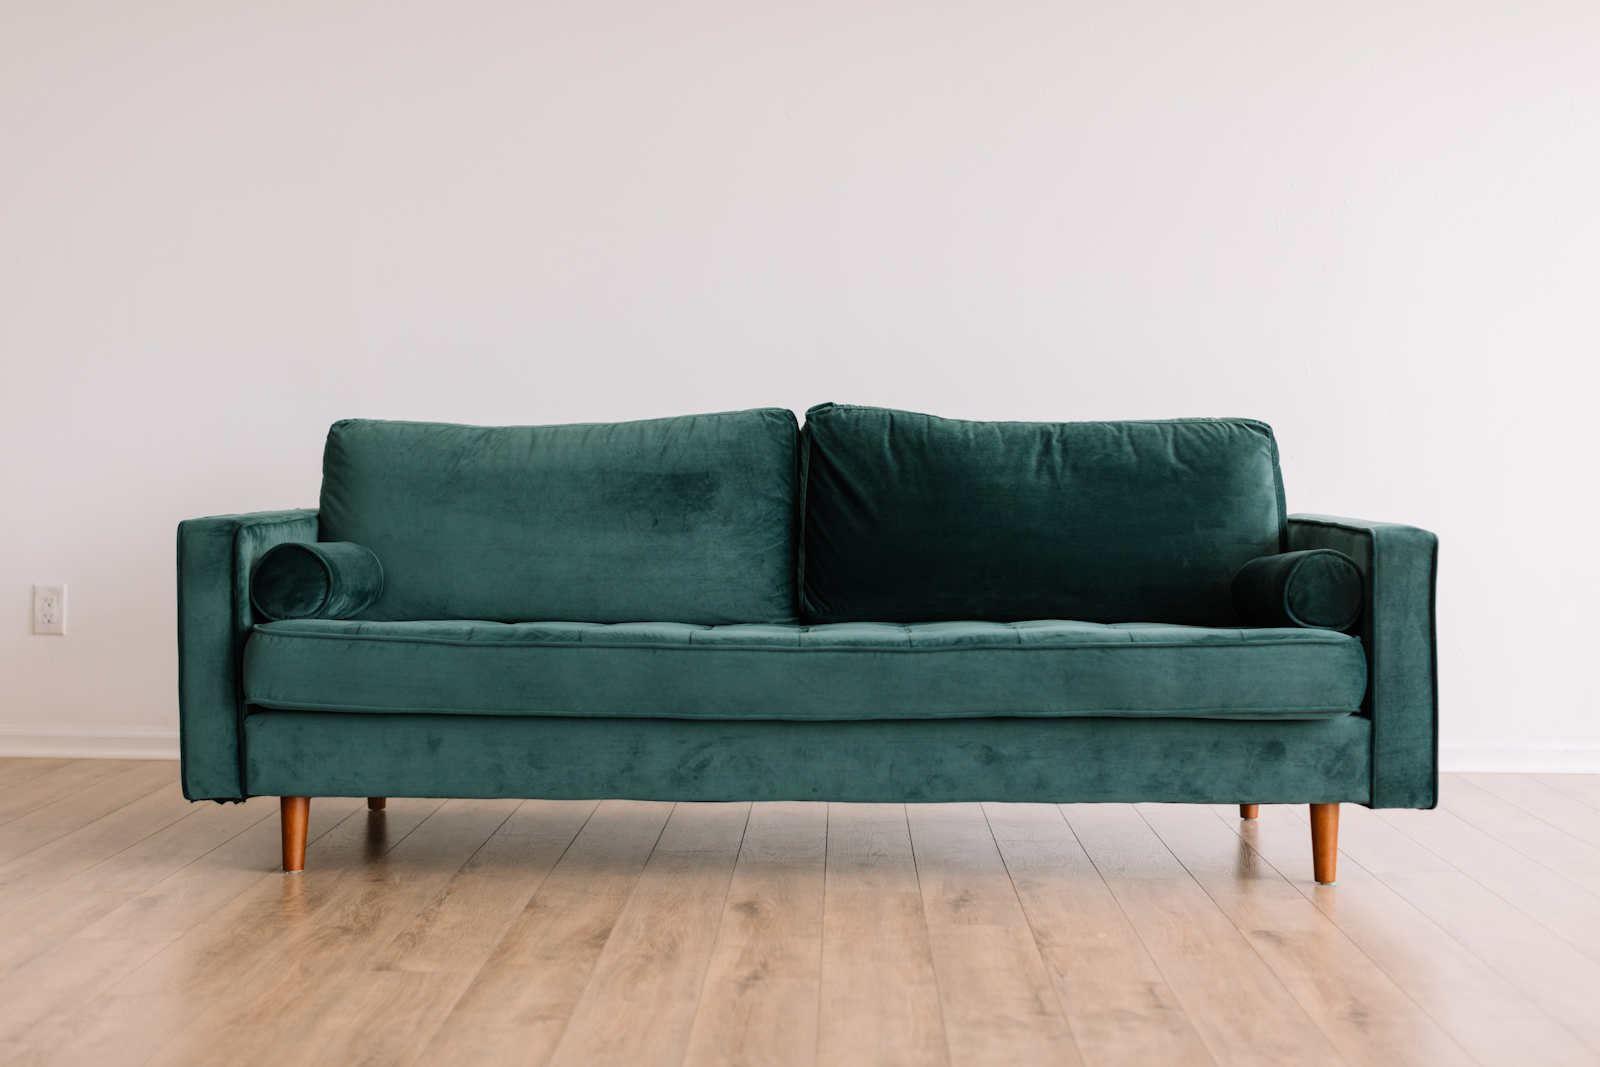 The Upholstery Shop & Biltfirm Furniture of Osborne Park